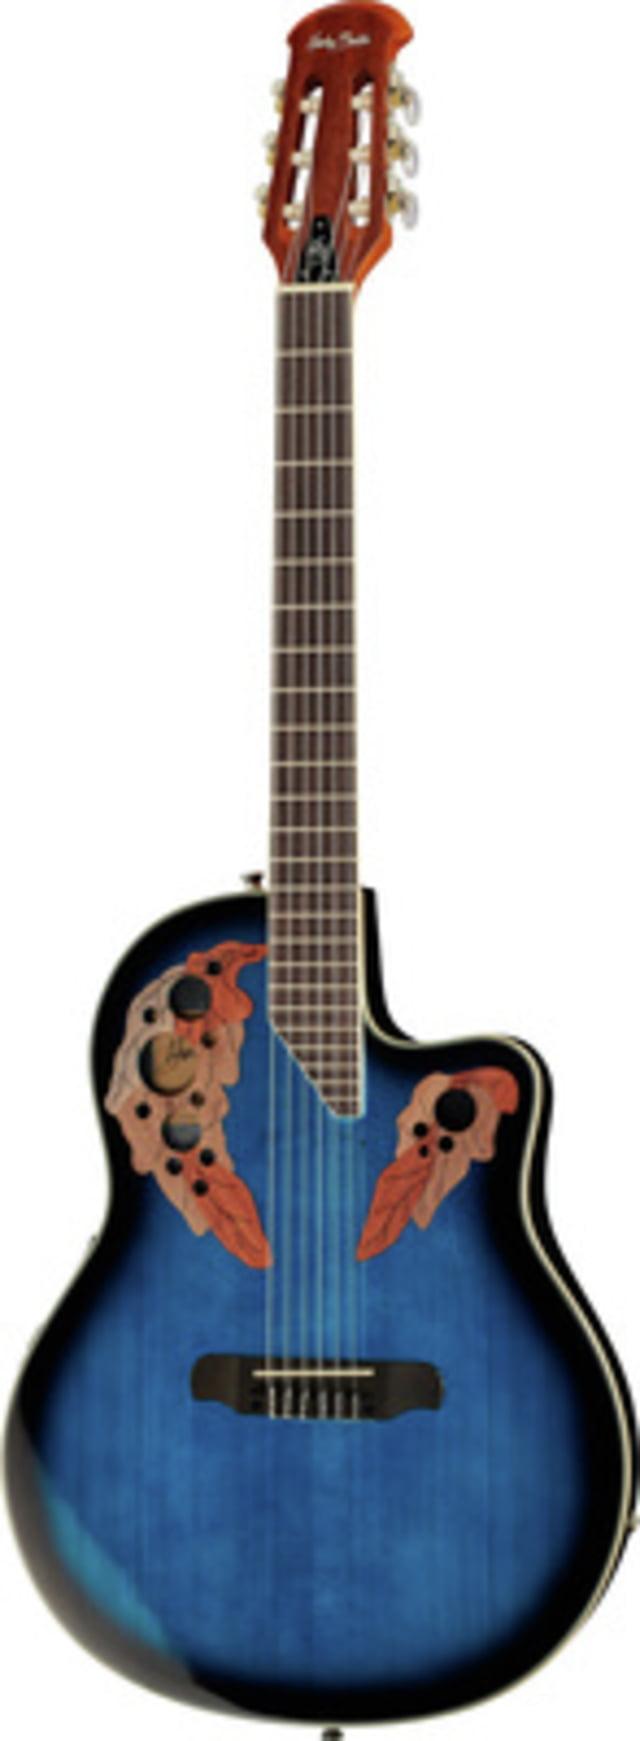 Harley Benton HBO-850 Classic Blue